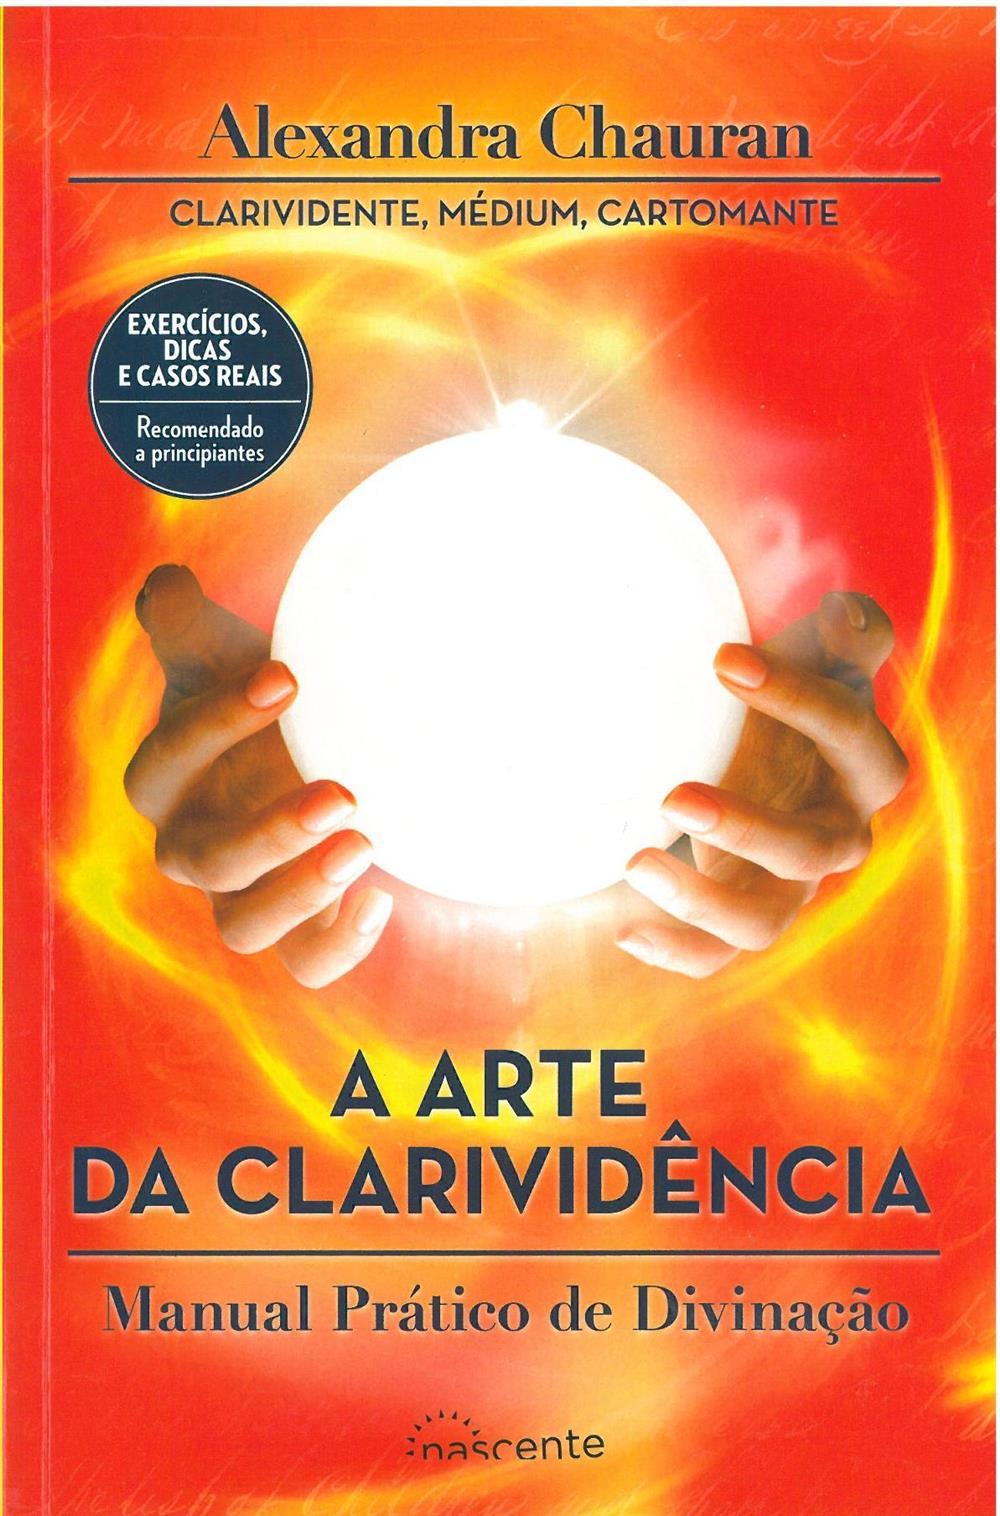 A arte da clarividência_.jpg